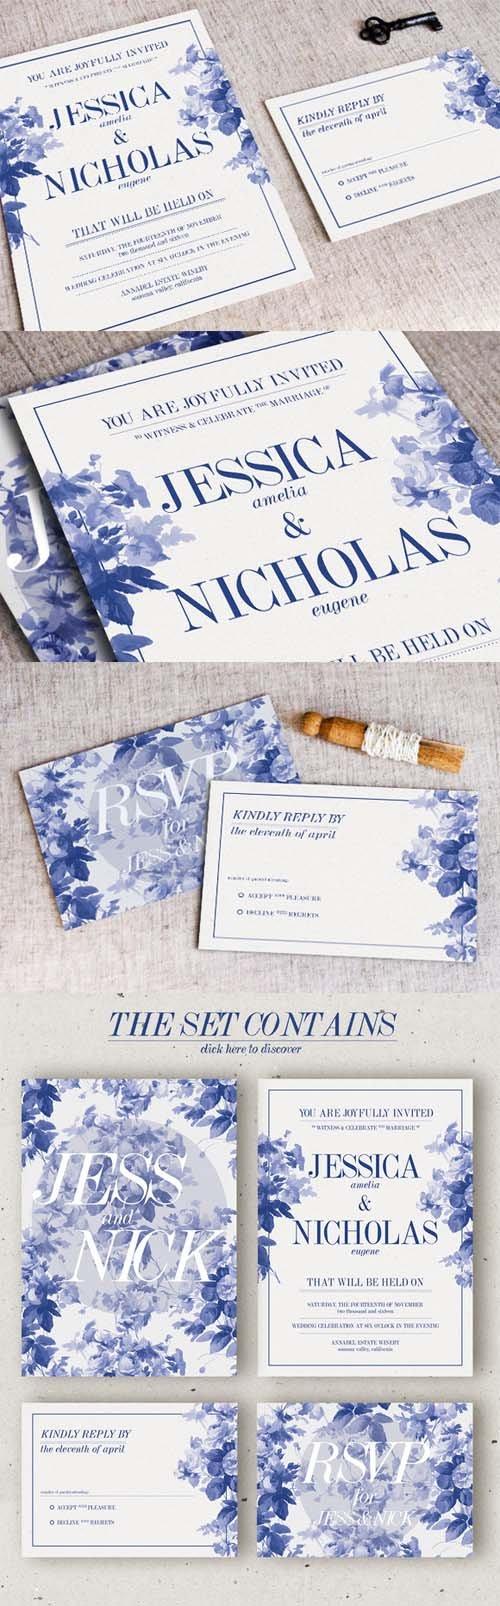 China Blue Wedding Invitation 352456